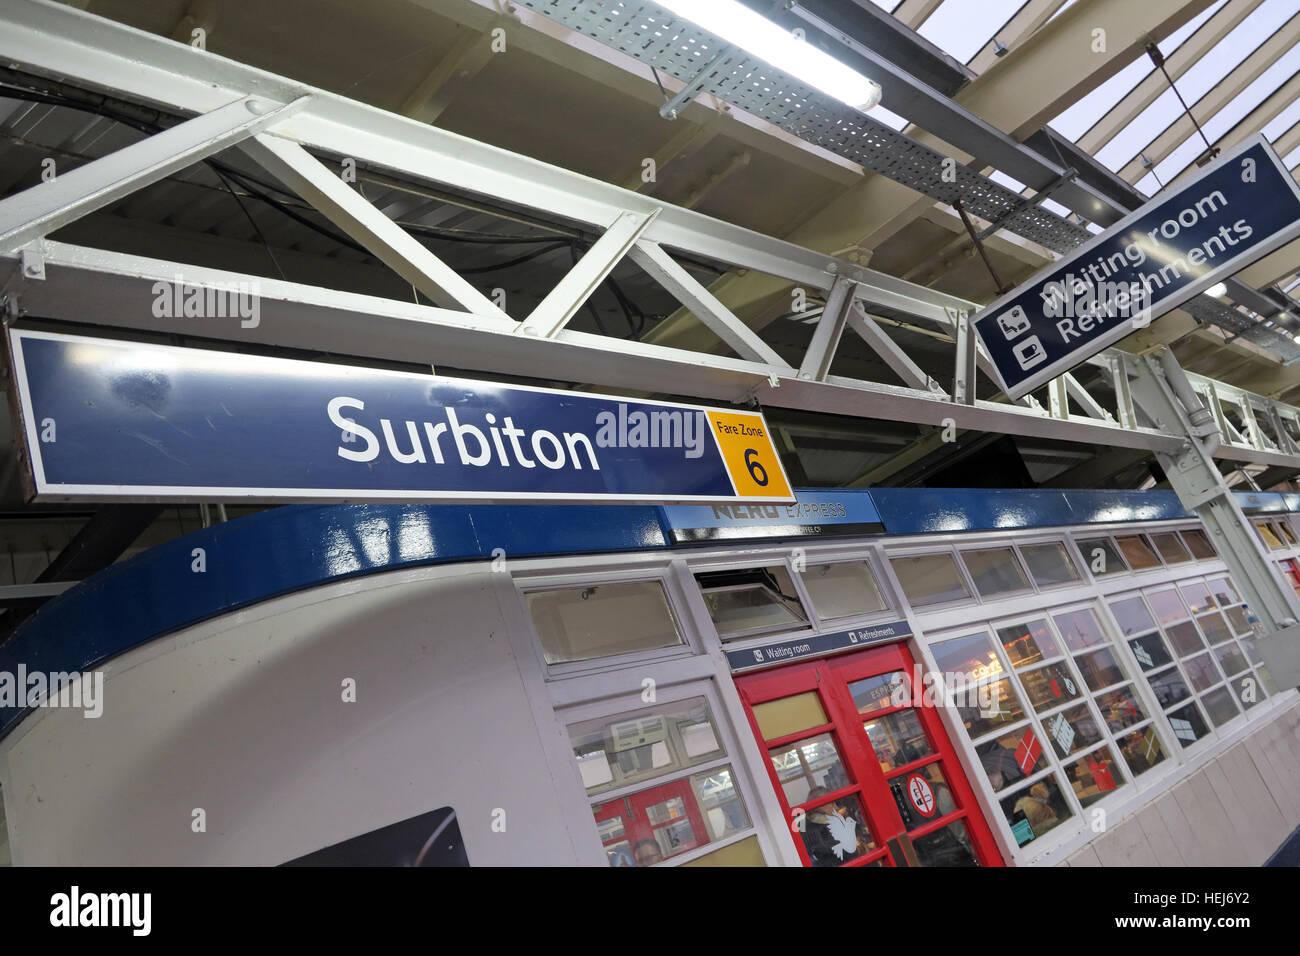 SW Trains,South,West,Trains,TOC,South West Trains,franchise,zone6,xone,six,6,artdeco,art-deco,suburban,Platform 3,Kingston,West London,England,UK,London,Surbiton Railway Station,Surbiton Station,BR,building,Waiting Room,Fare,Fare zone6,GoTonySmith,@HotpixUK,Tony,Smith,UK,GB,Great,Britain,United,Kingdom,English,British,England,London,Greater,problem,with,problem with,issue with,LDN,City,Centre,cities,Urban,Urbanist,town,infrastructure,transport,tour,tourism,tourists,urban,attraction,attractions,Buy Pictures of,Buy Images Of,Images of,Stock Images,Tony Smith,United Kingdom,Great Britain,Greater London,British Isles,City Centre